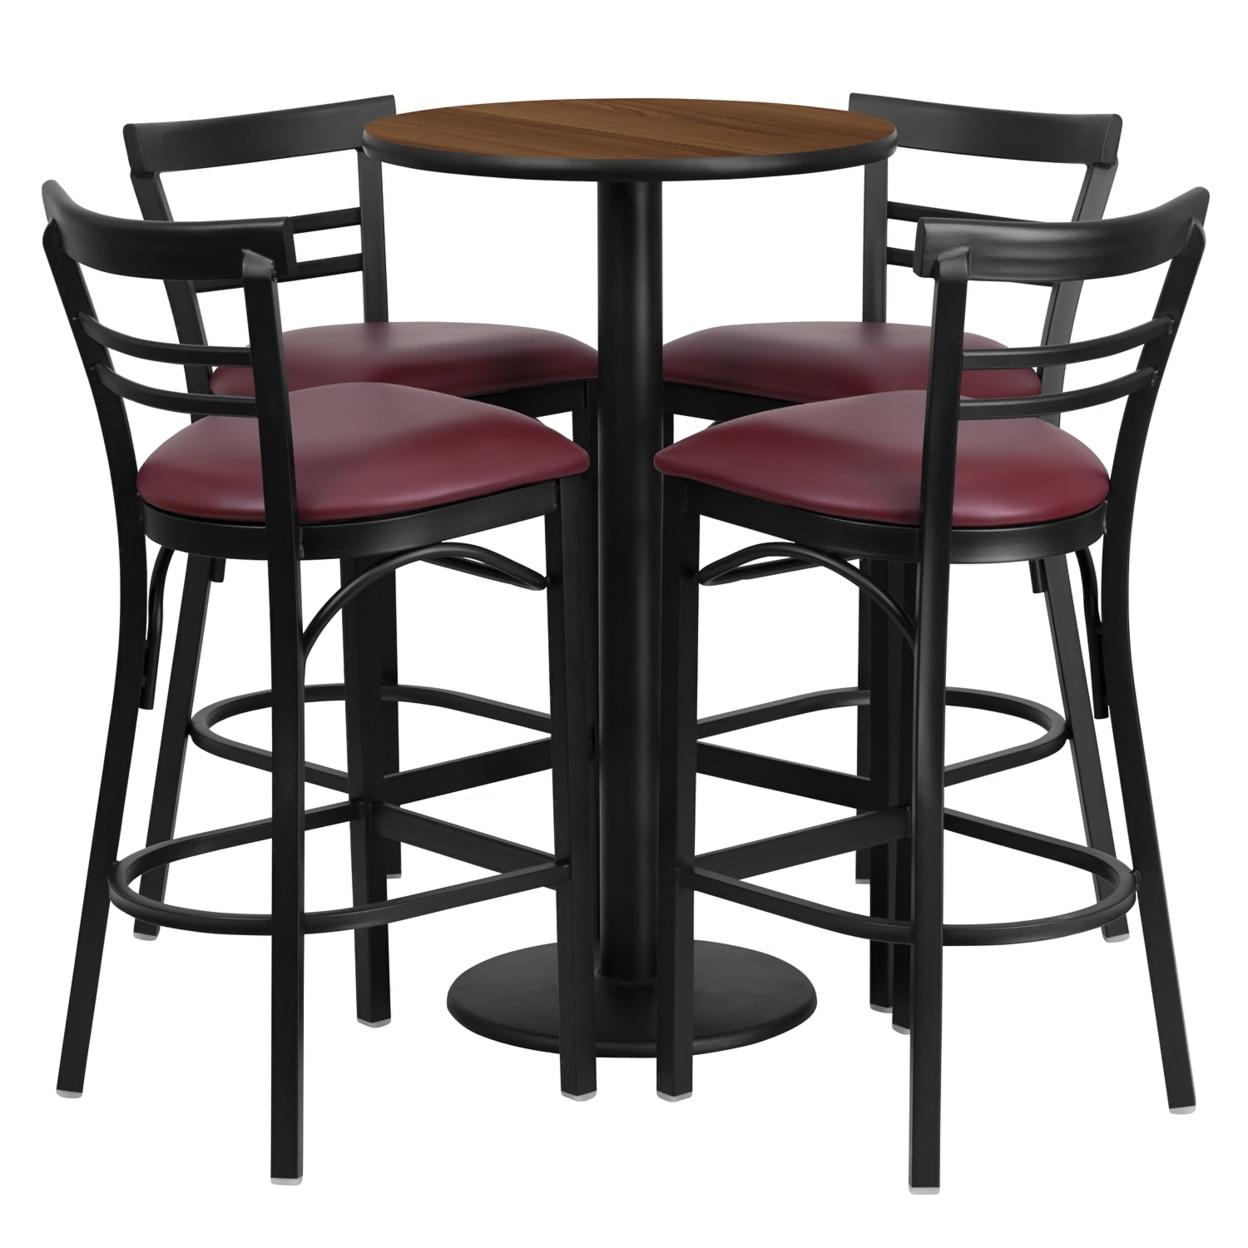 все цены на Flash Furniture 24'' Round Walnut Laminate Table Set with 4 Ladder Back Metal Bar Stools - Burgundy Vinyl Seat [863-RSRB1040-GG]